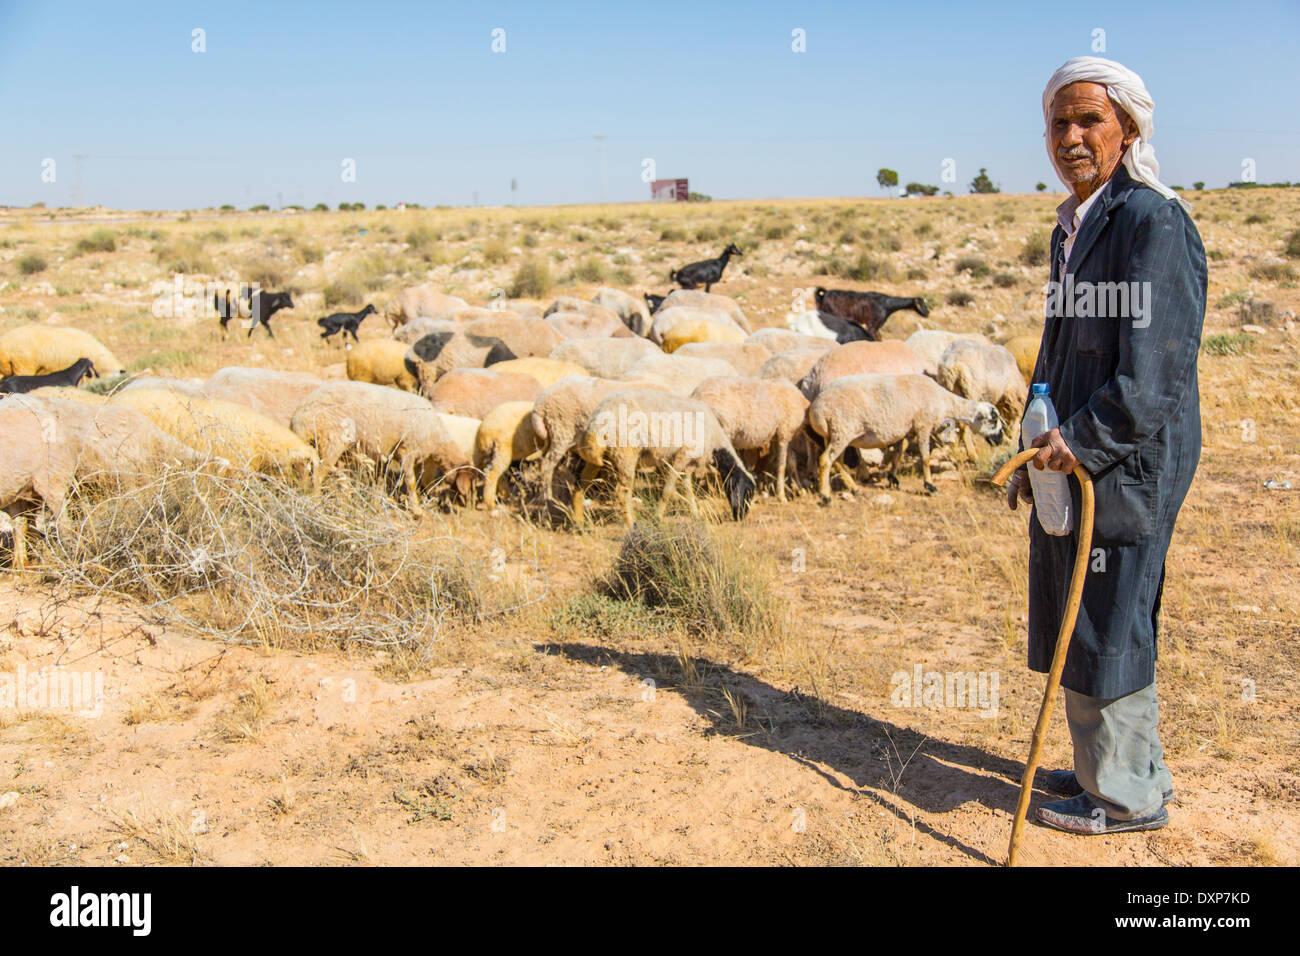 Shepherd and his sheep, Tunisia - Stock Image